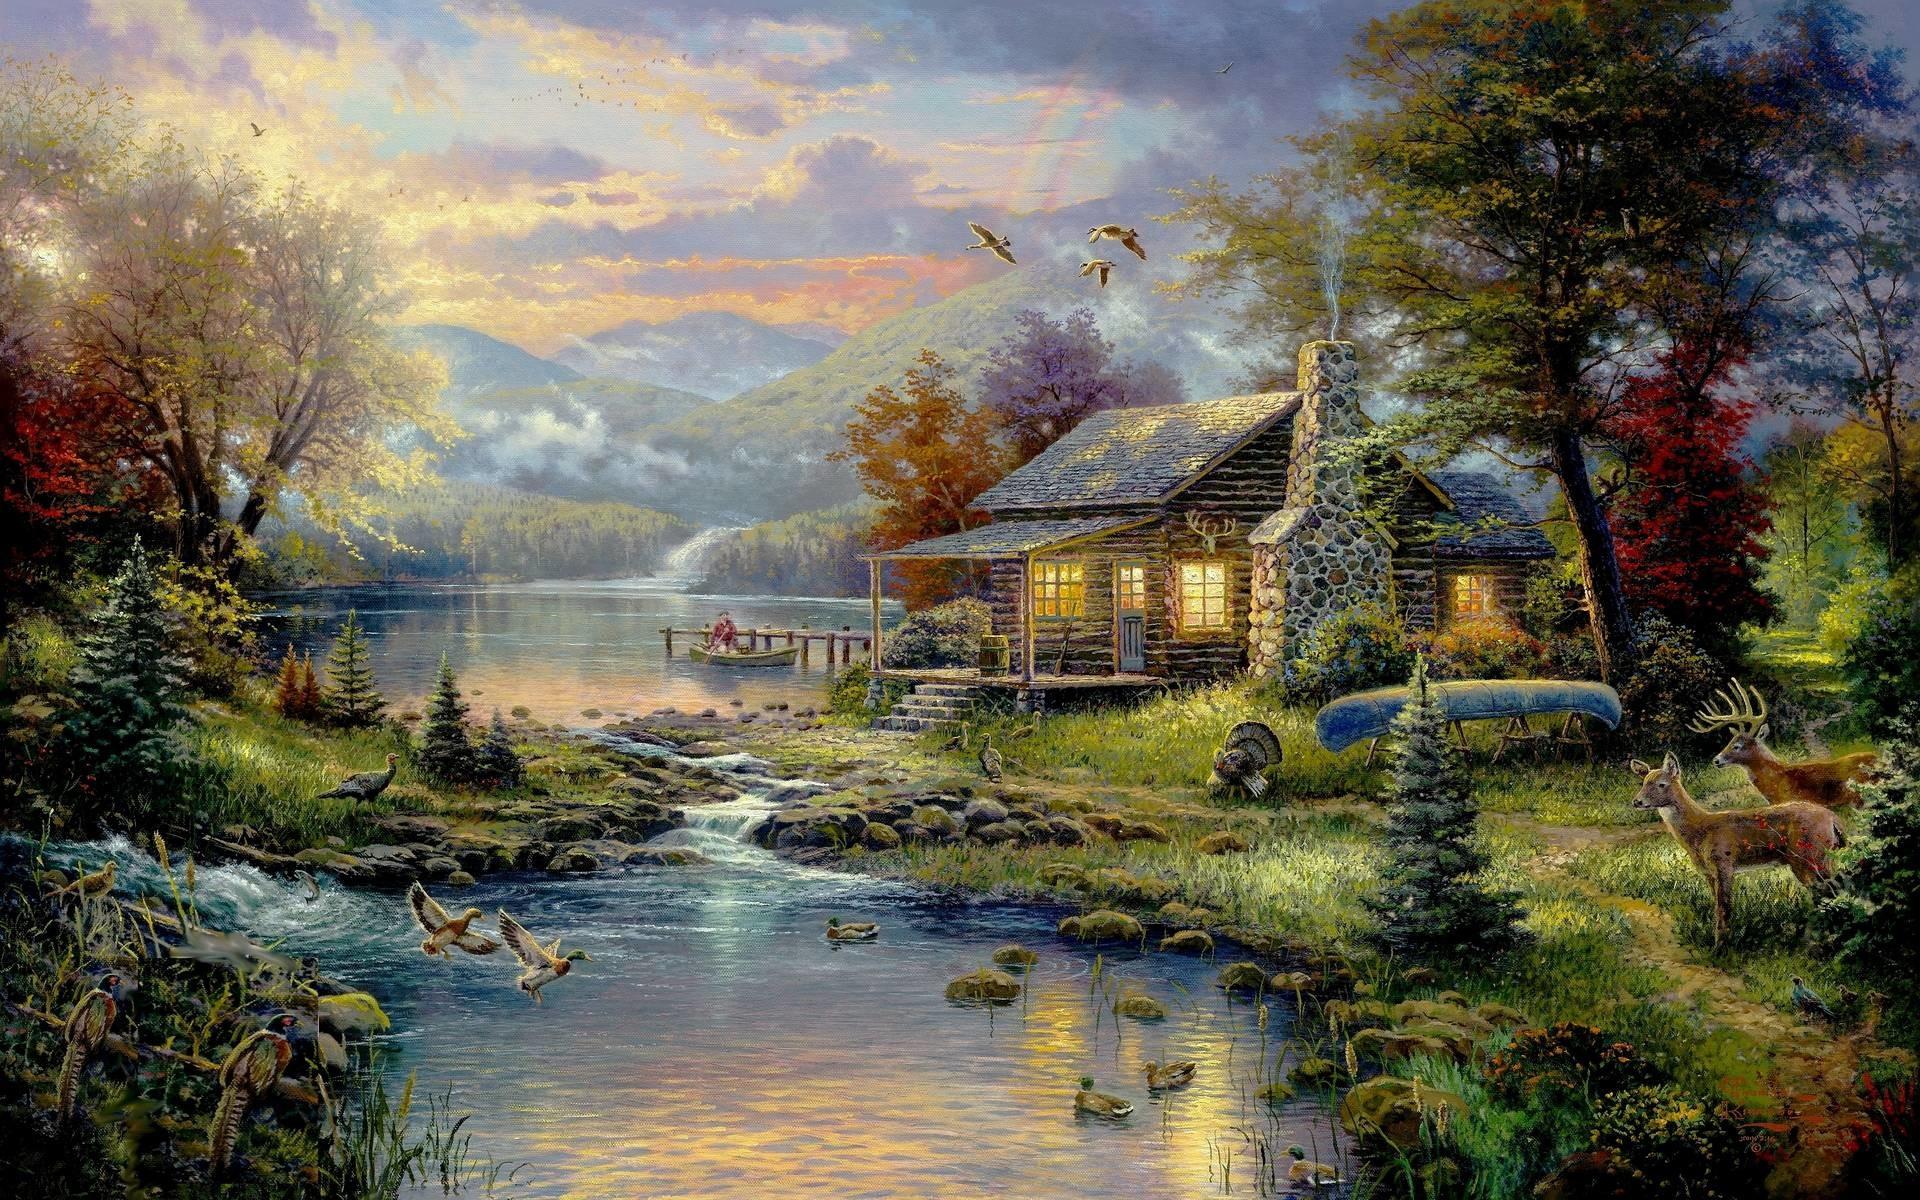 Thomas Kinkade Wallpaper | HD Wallpapers Pictures